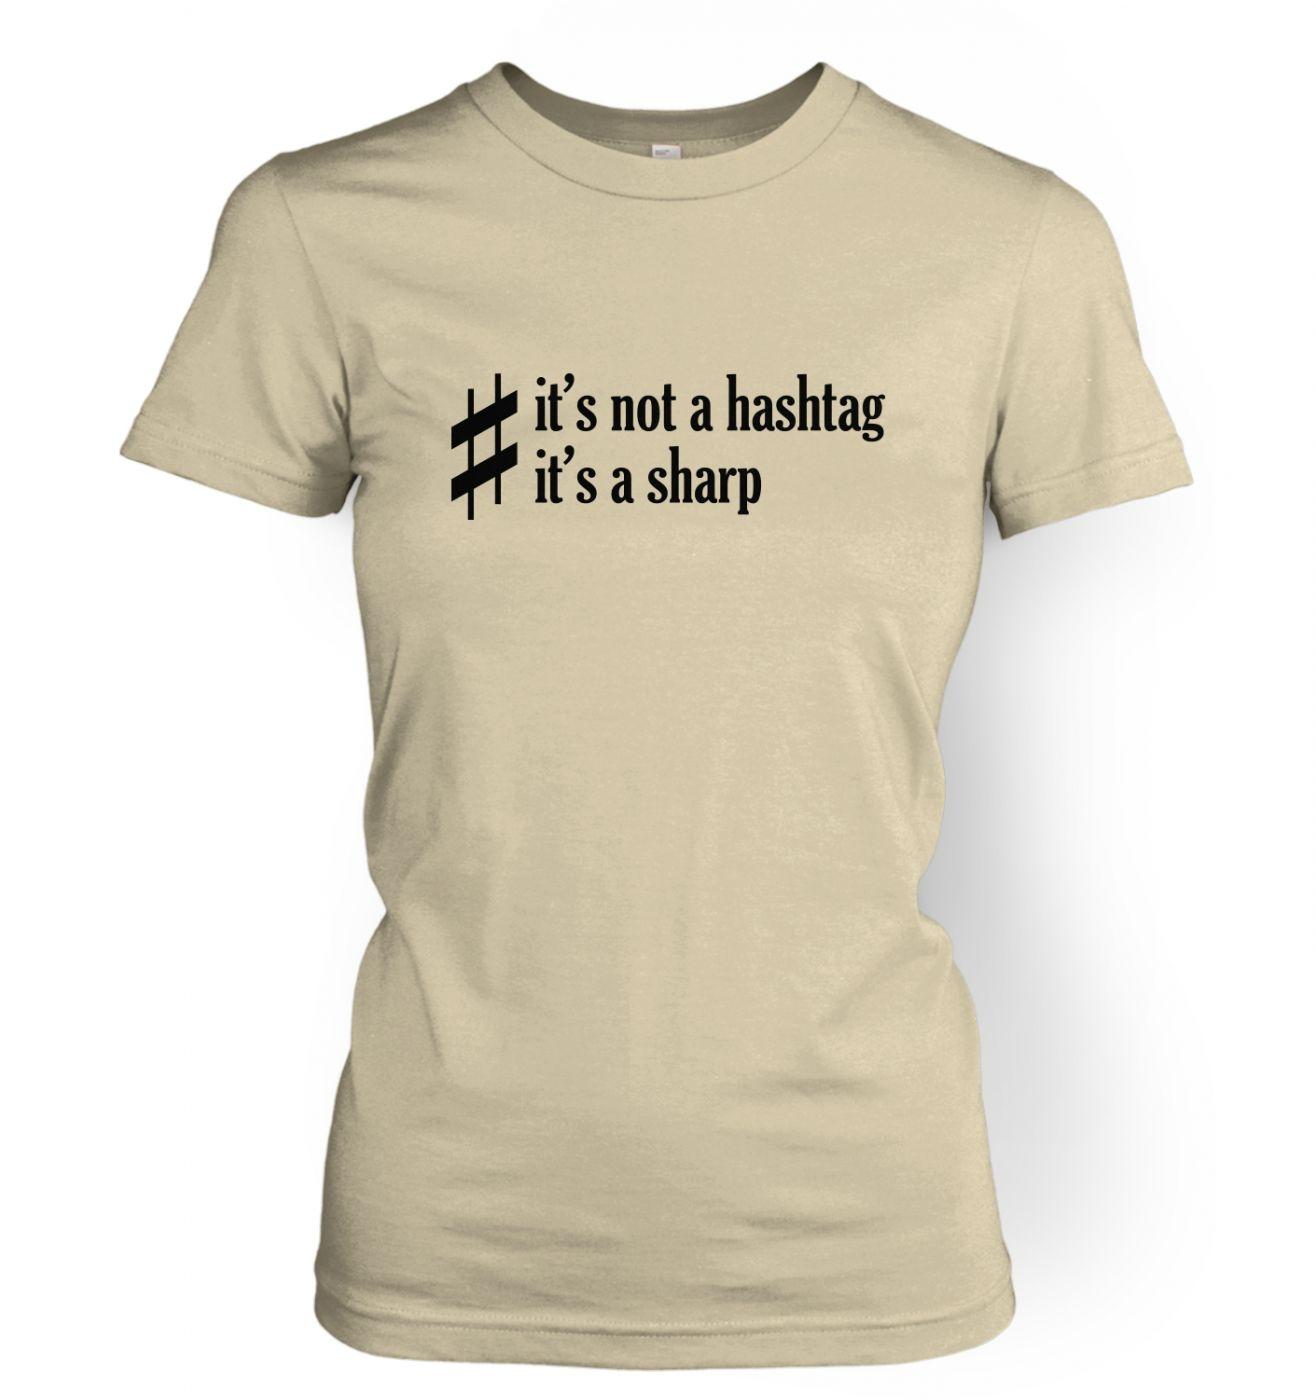 It's Not A Hashtag It's A Sharp women's t-shirt